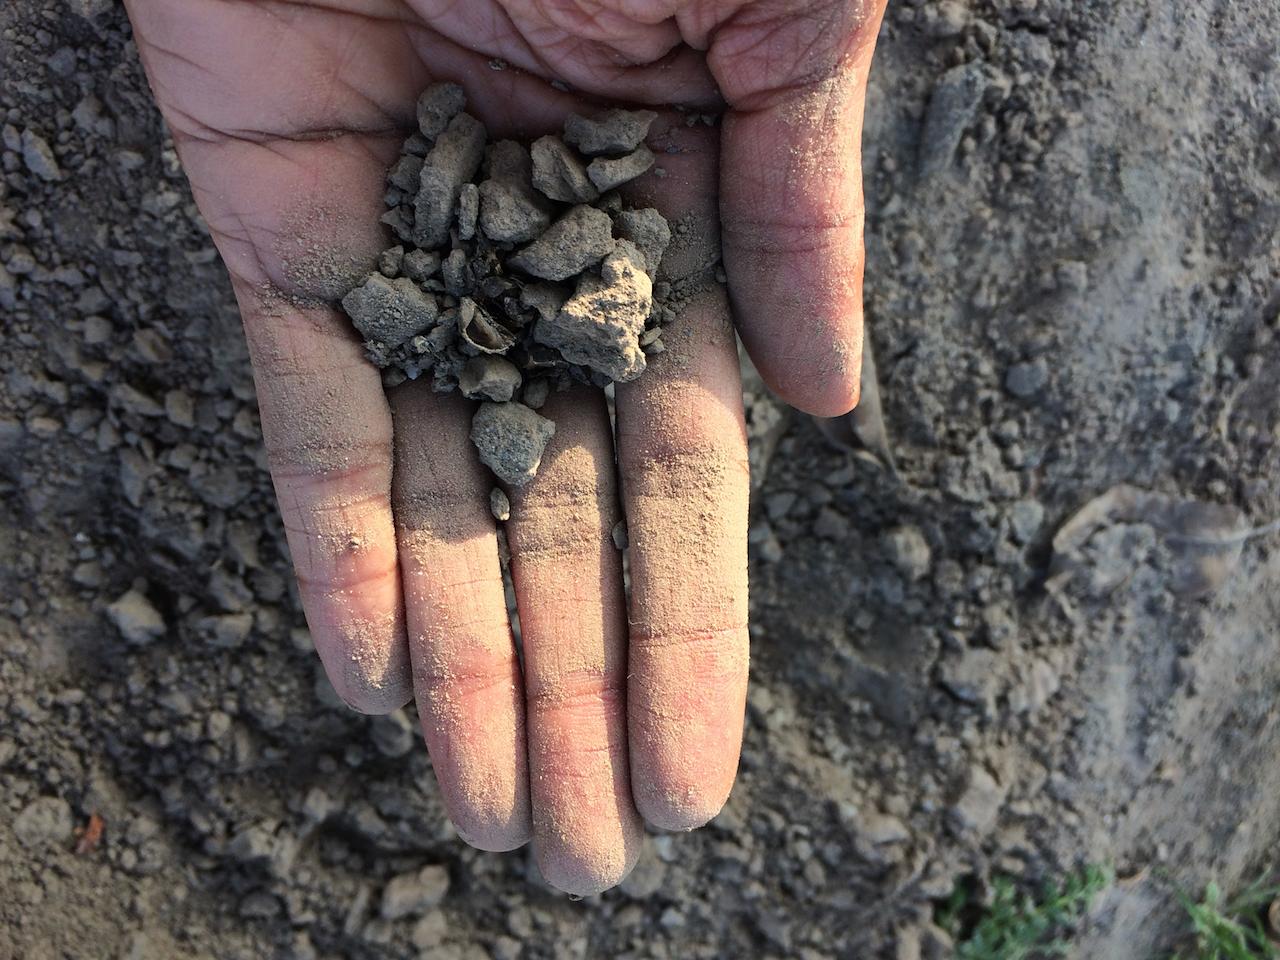 The soil of Baba Nanak's field - pic. Gurmeet Kaur Feb 2018